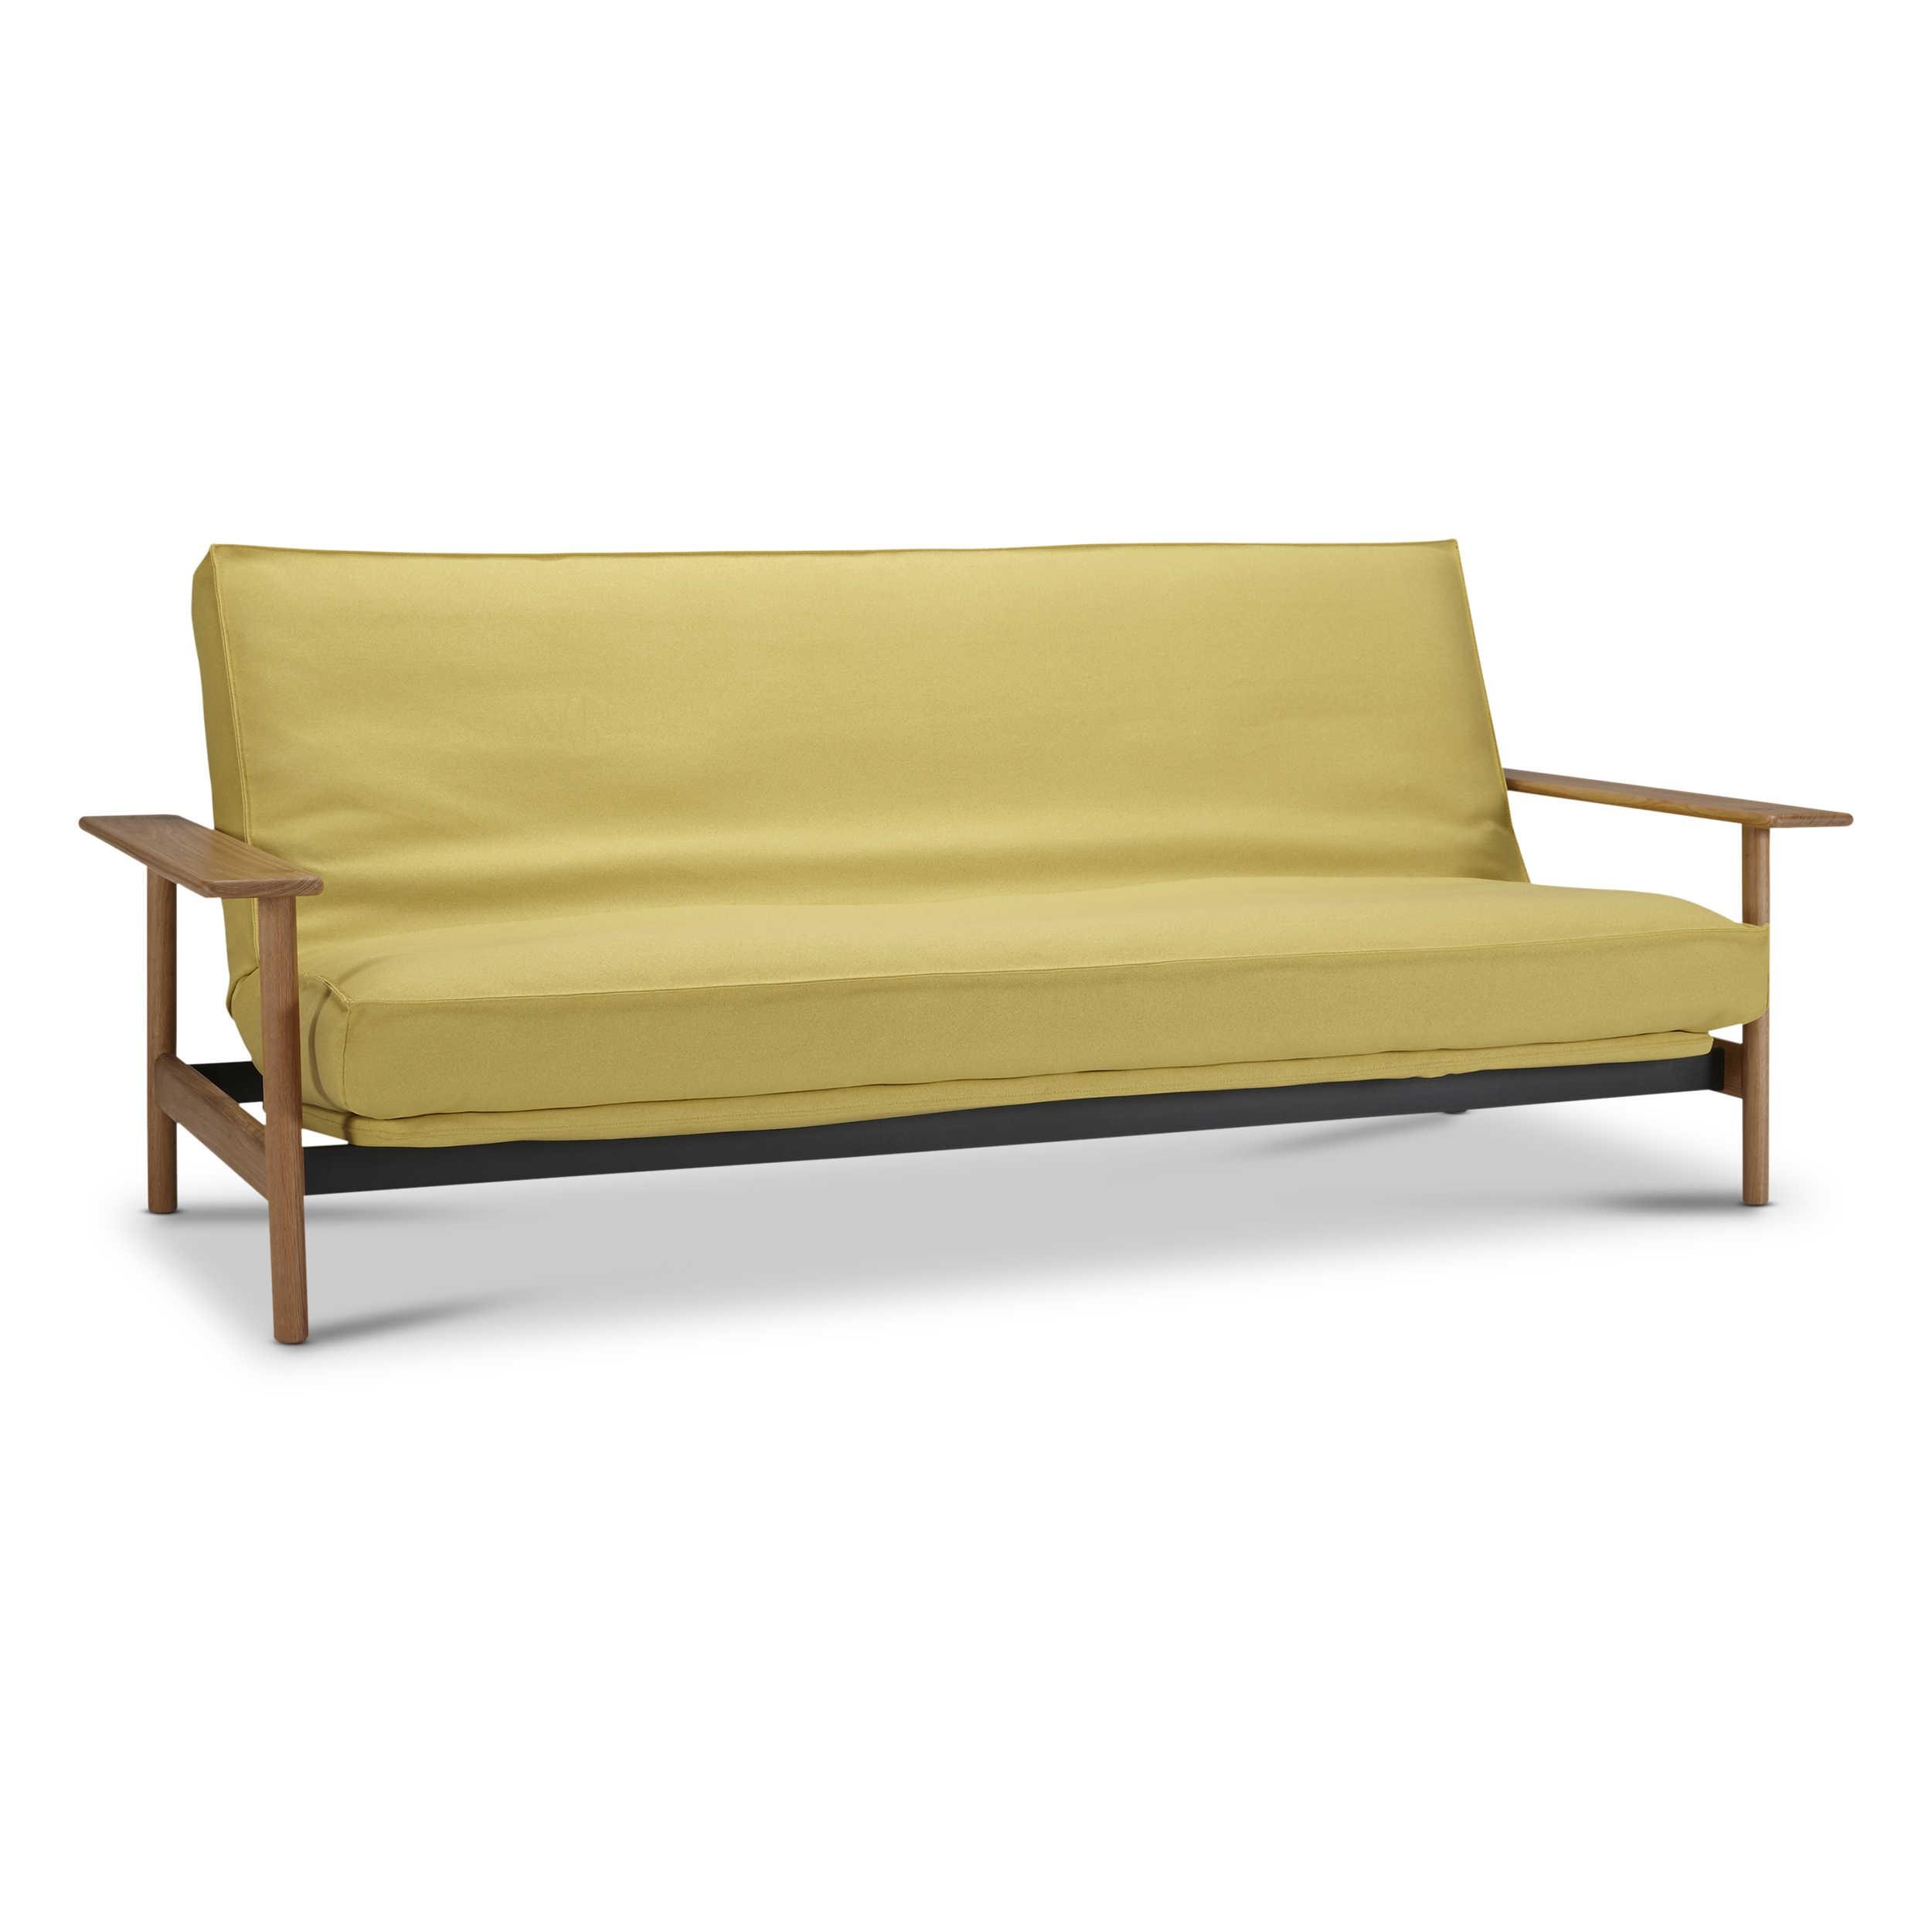 innovation schlafsofa balder gelb stoff online kaufen bei. Black Bedroom Furniture Sets. Home Design Ideas